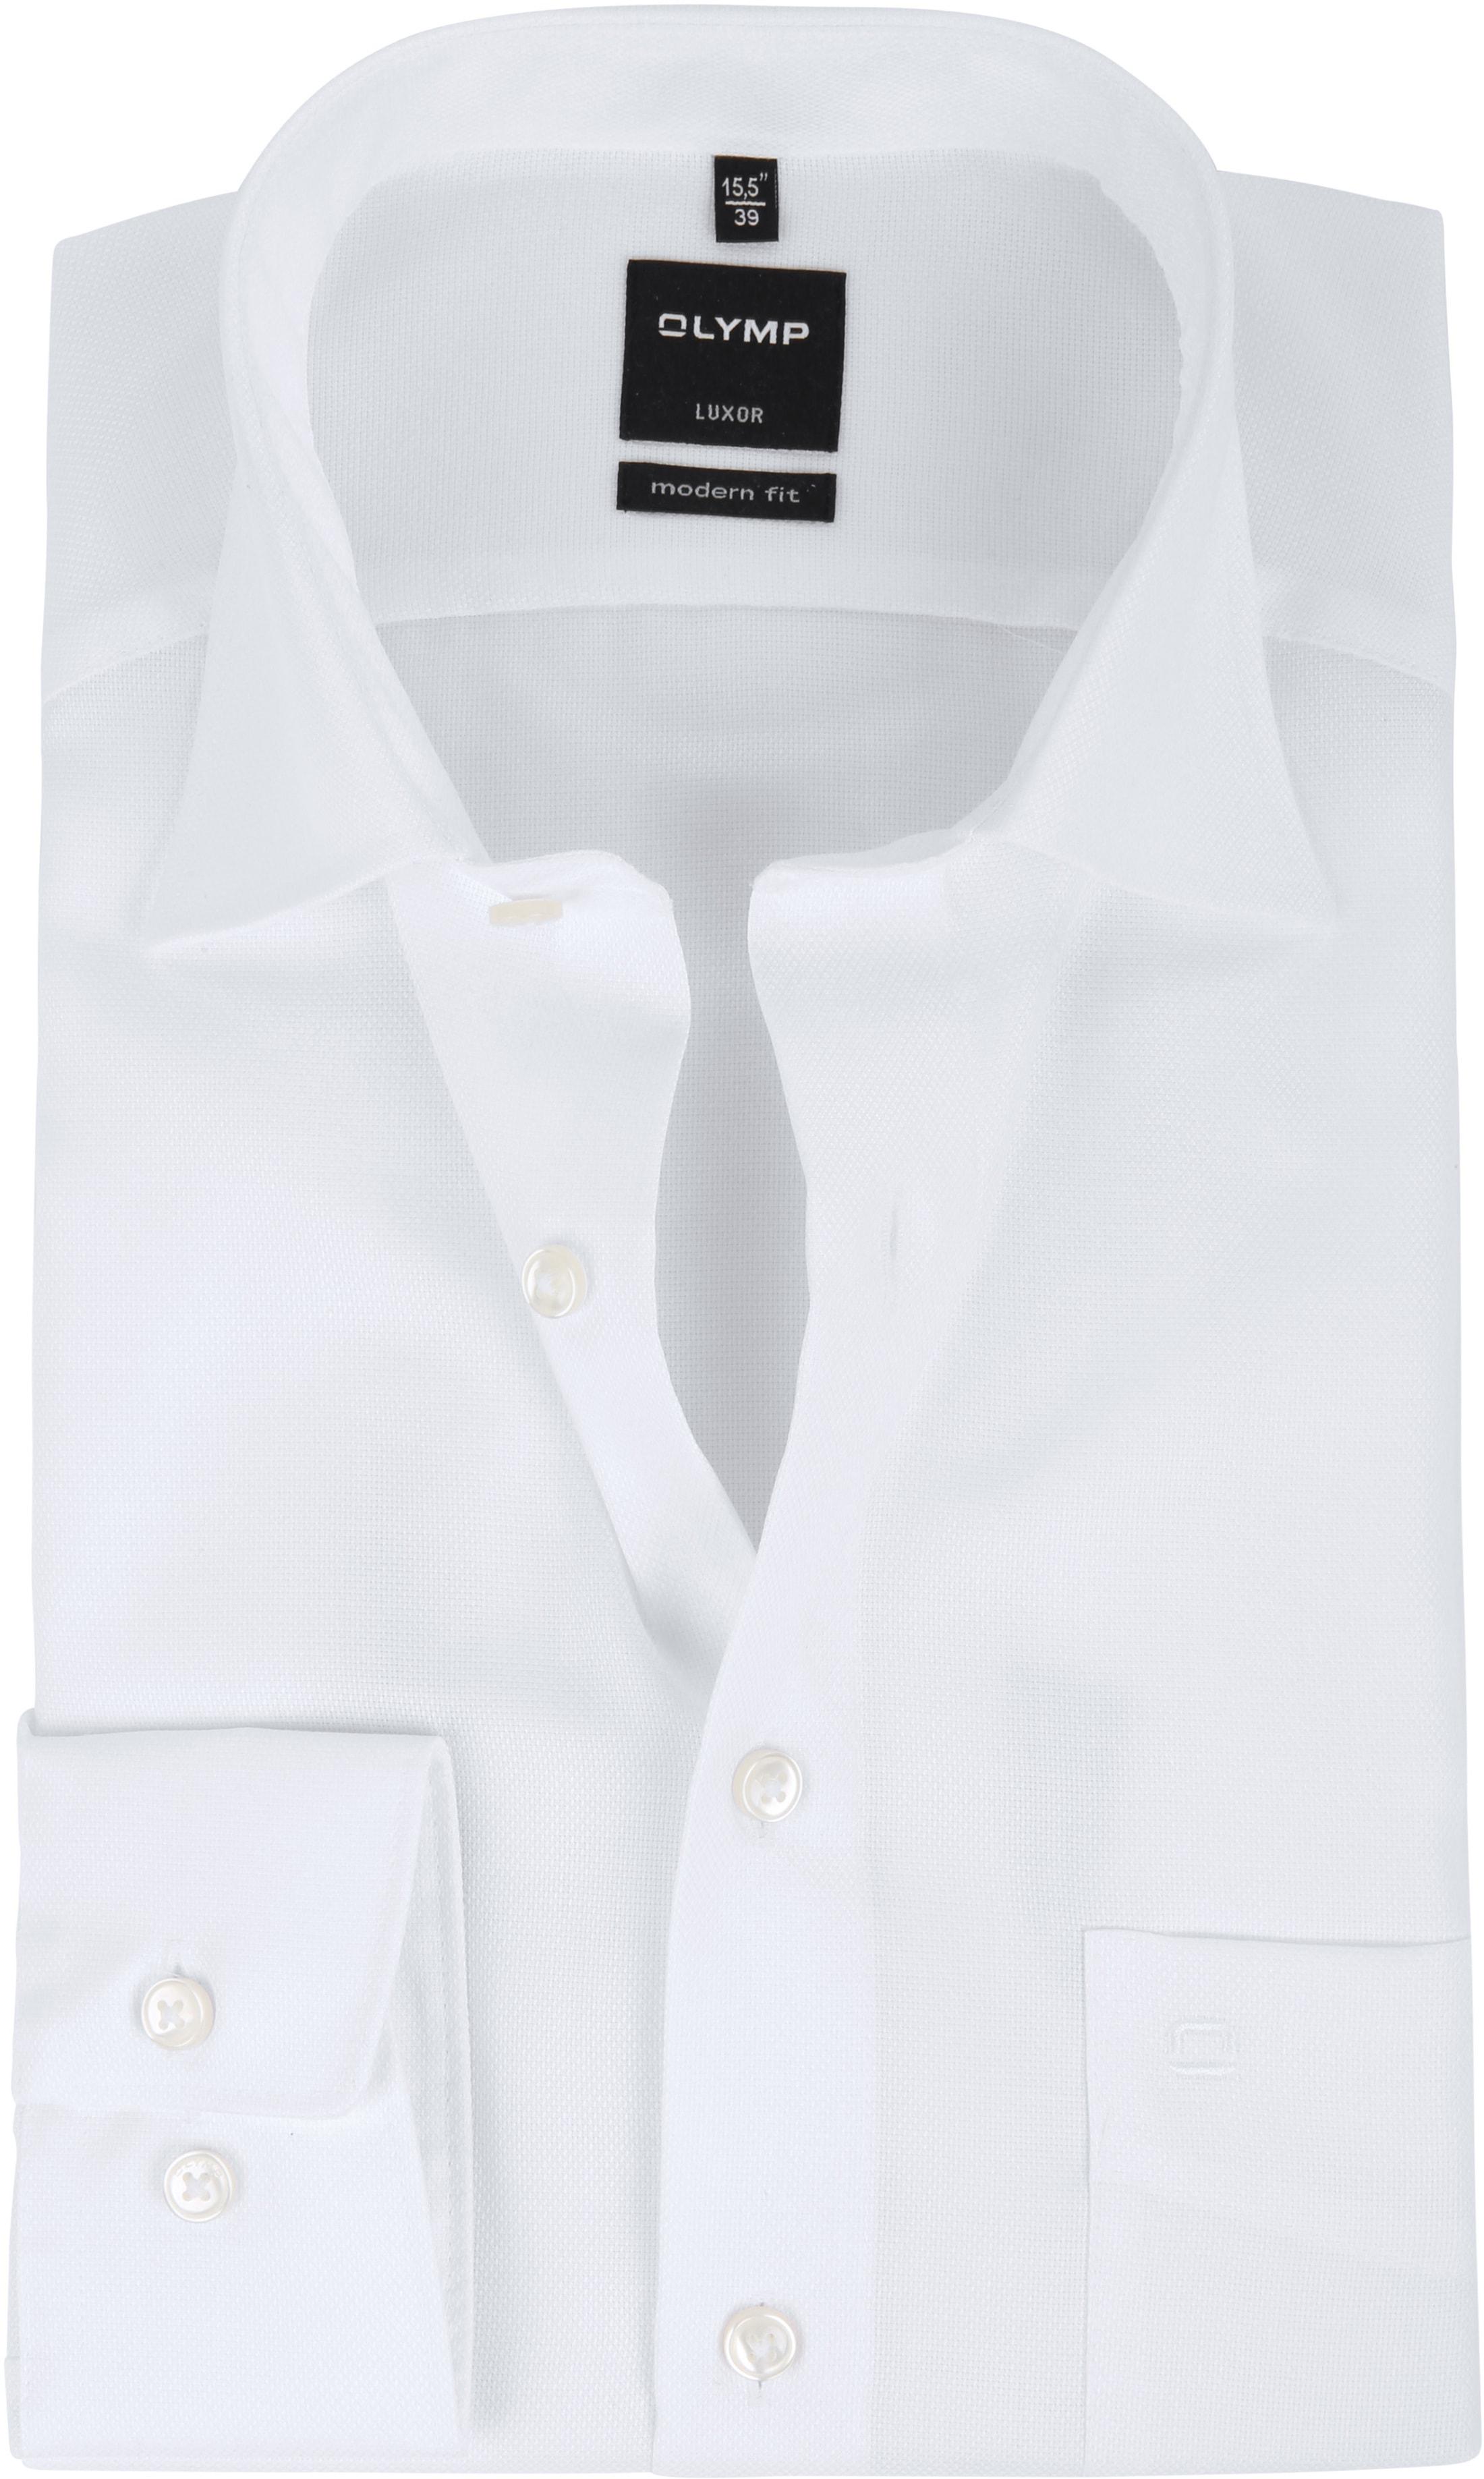 Olymp Luxor Shirt Modern Fit White foto 0